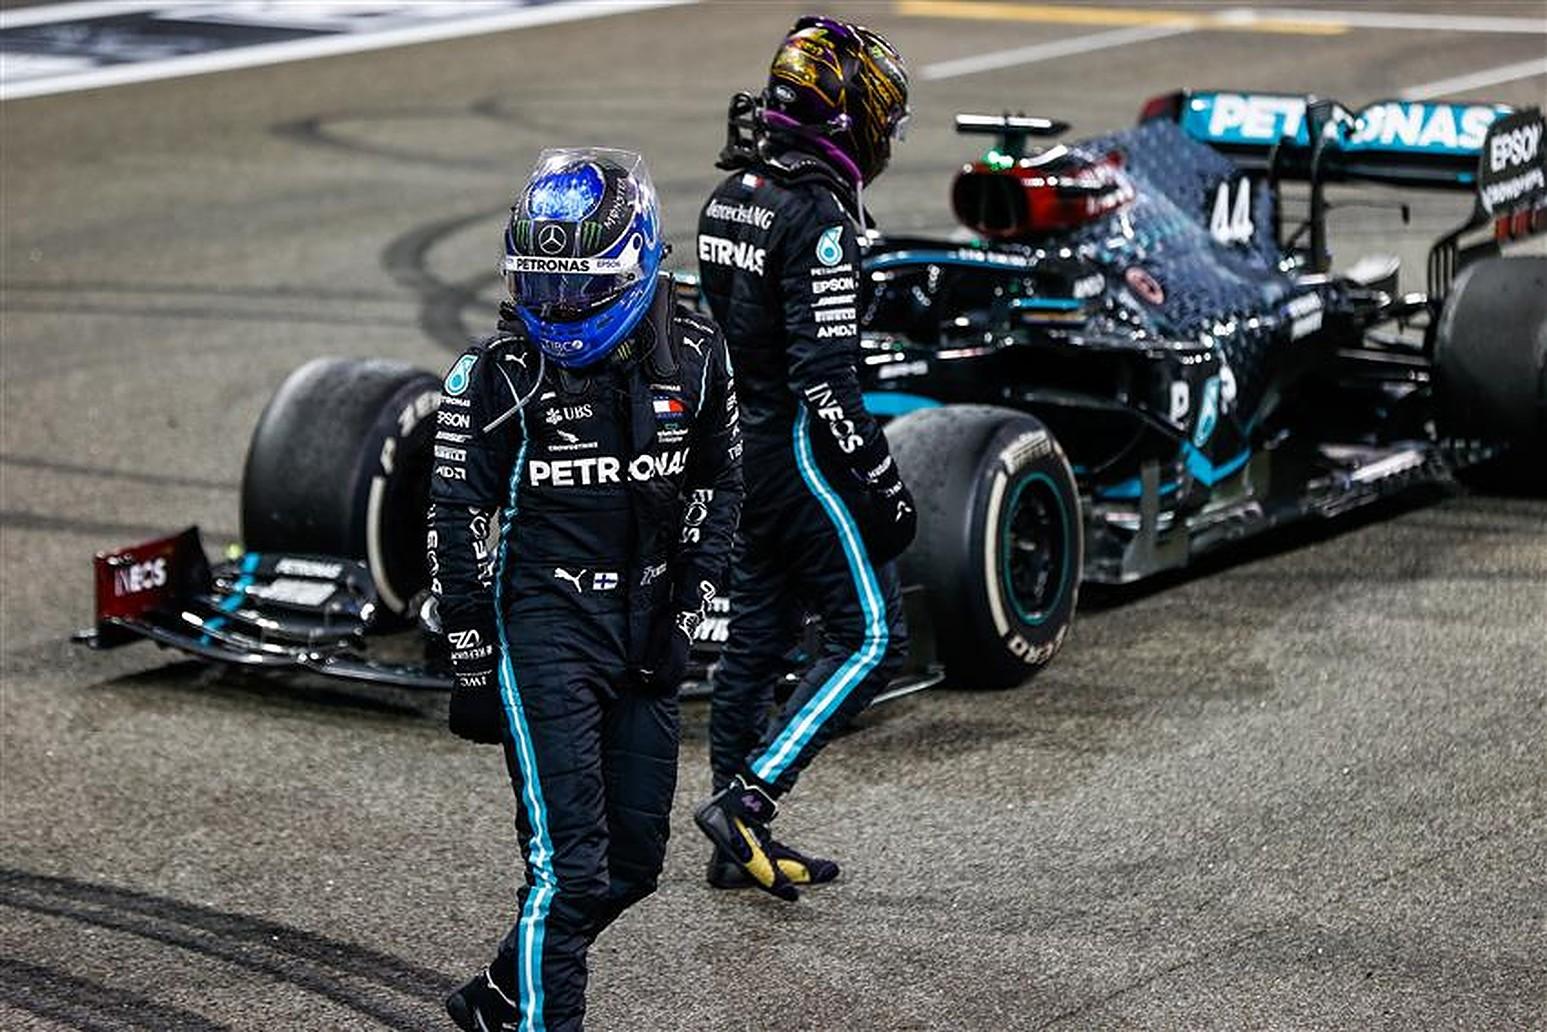 Lewis Hamilton and Valtteri Bottas at Mercedes 2021 - Formula1News.co.uk